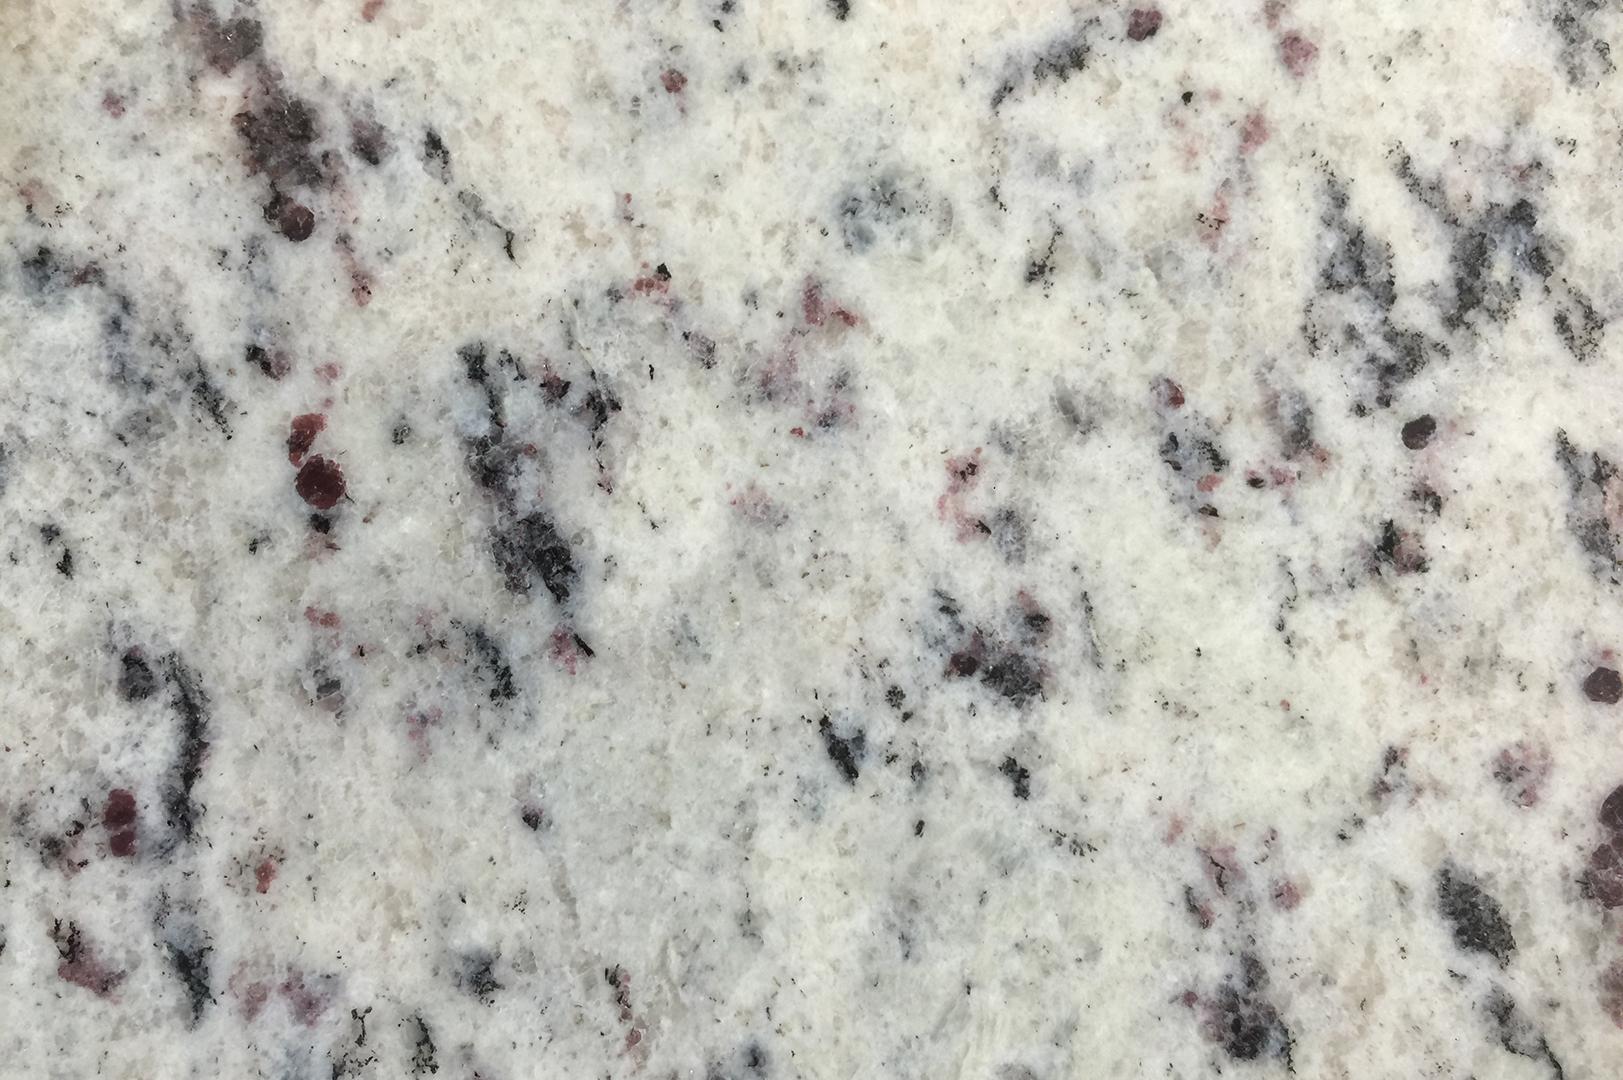 Granite Countertop Samples  Kansas City  Kennys Tile